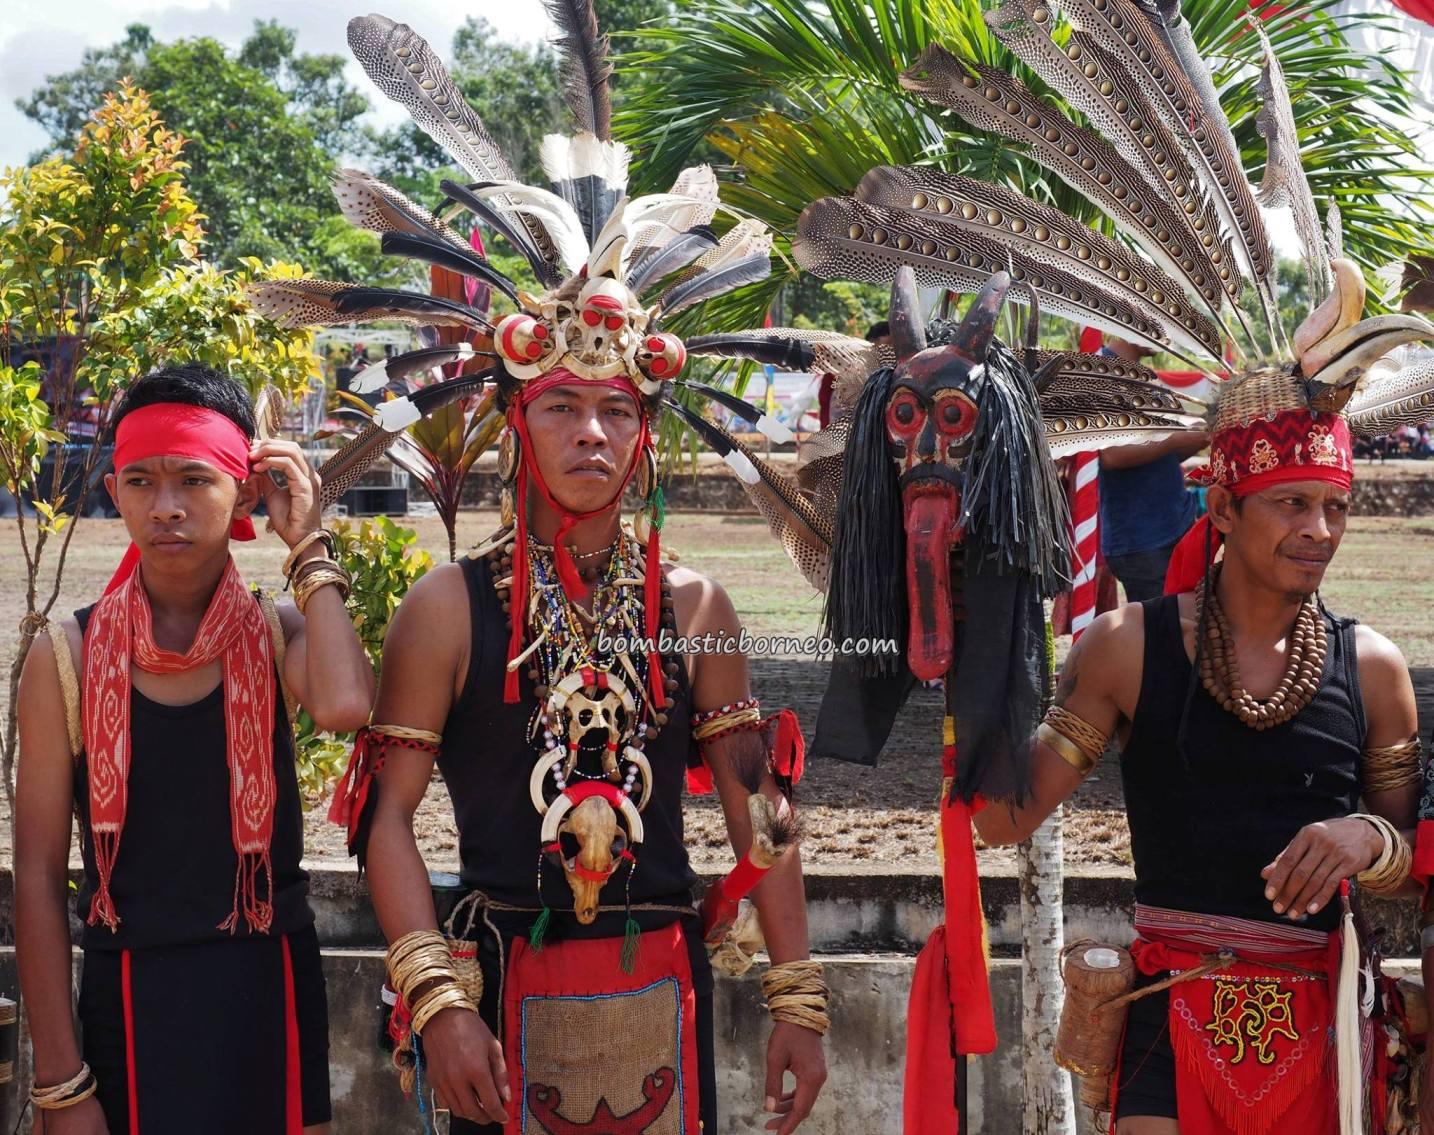 paddy harvest festival, indigenous, traditional, culture, event, Borneo, Kalimantan Barat, native, tribal, Obyek wisata, travel guide, cross border, 跨境婆罗洲游踪, 印尼西加里曼丹, 传统原住民部落文化